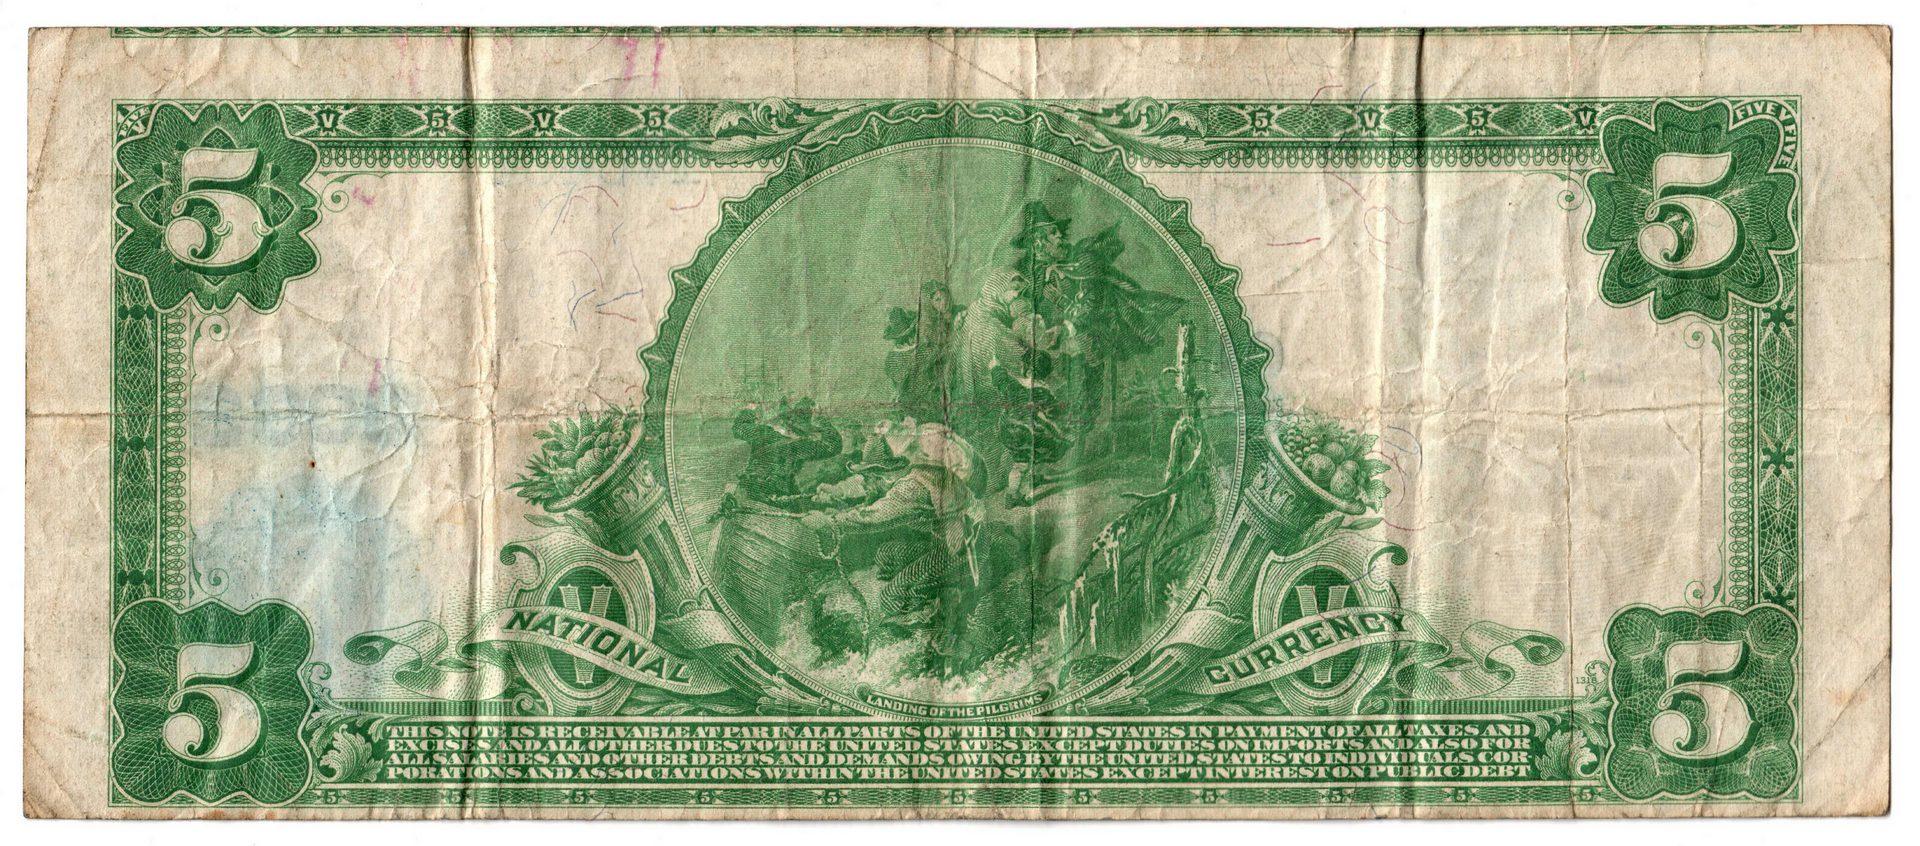 Lot 76: 1902 $5 American National Bank of Nashville, Miscu